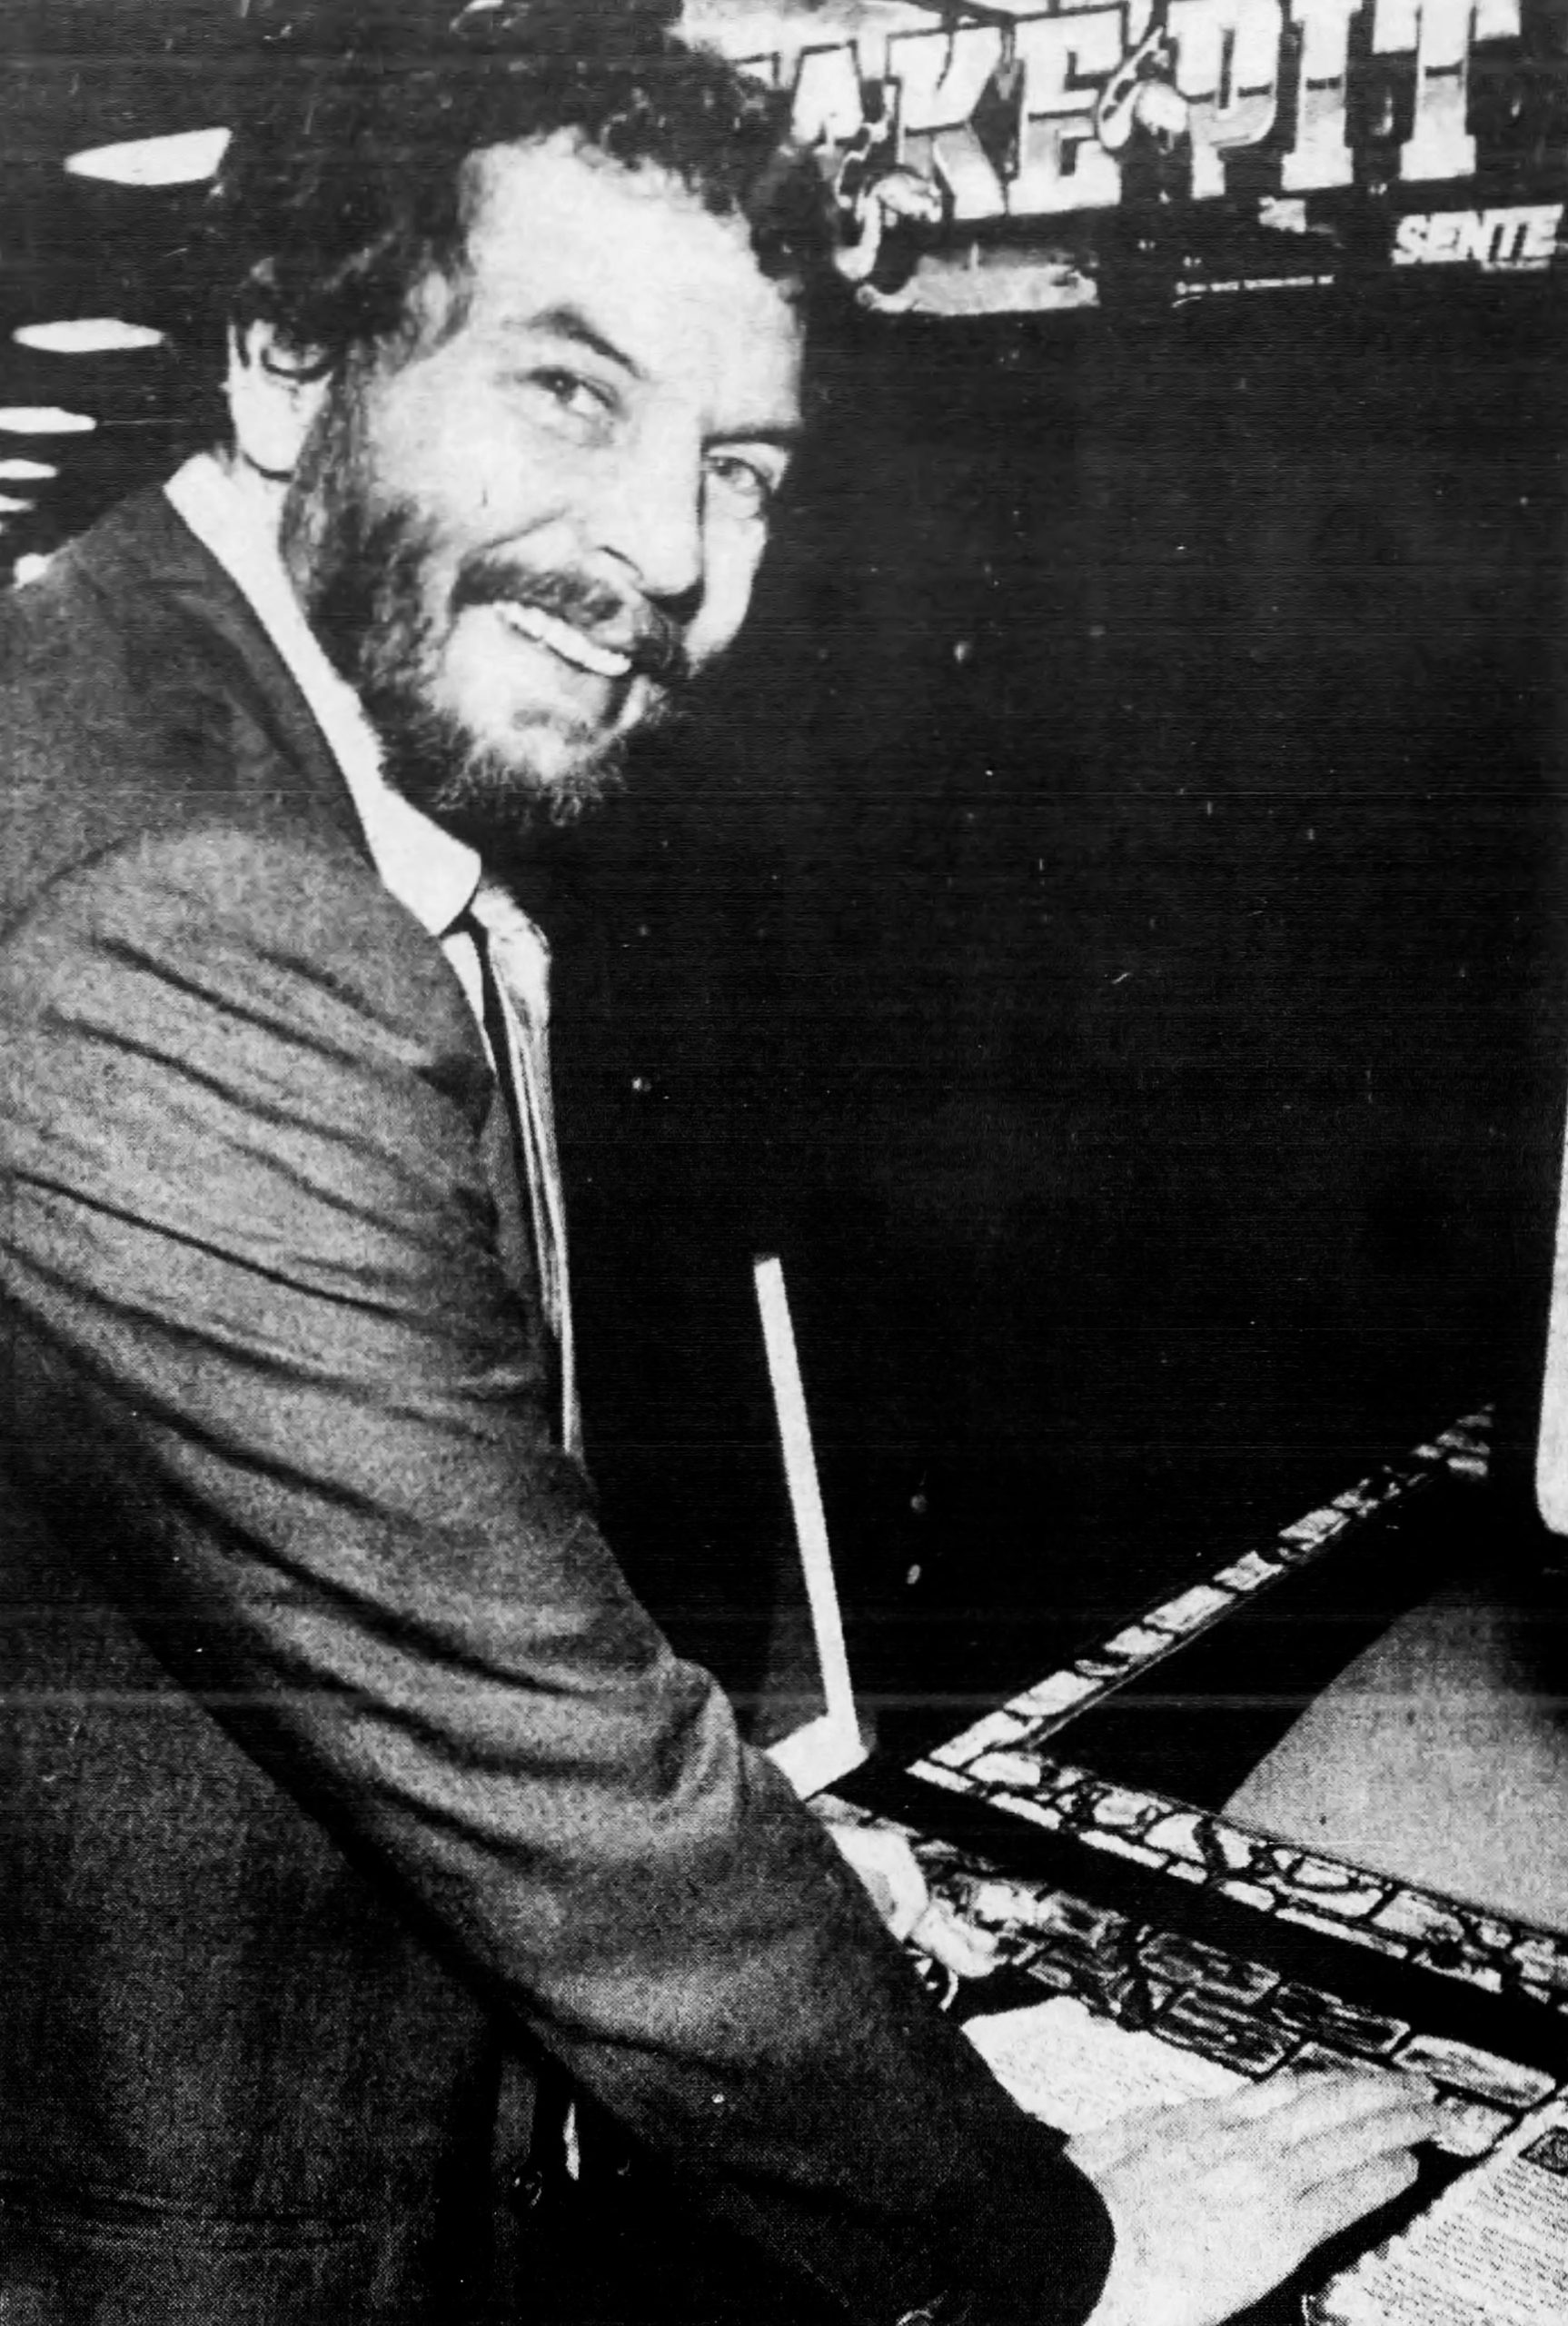 Atari founder Nolan Bushnell playing video arcade game Snake Pit, by Bally Sente